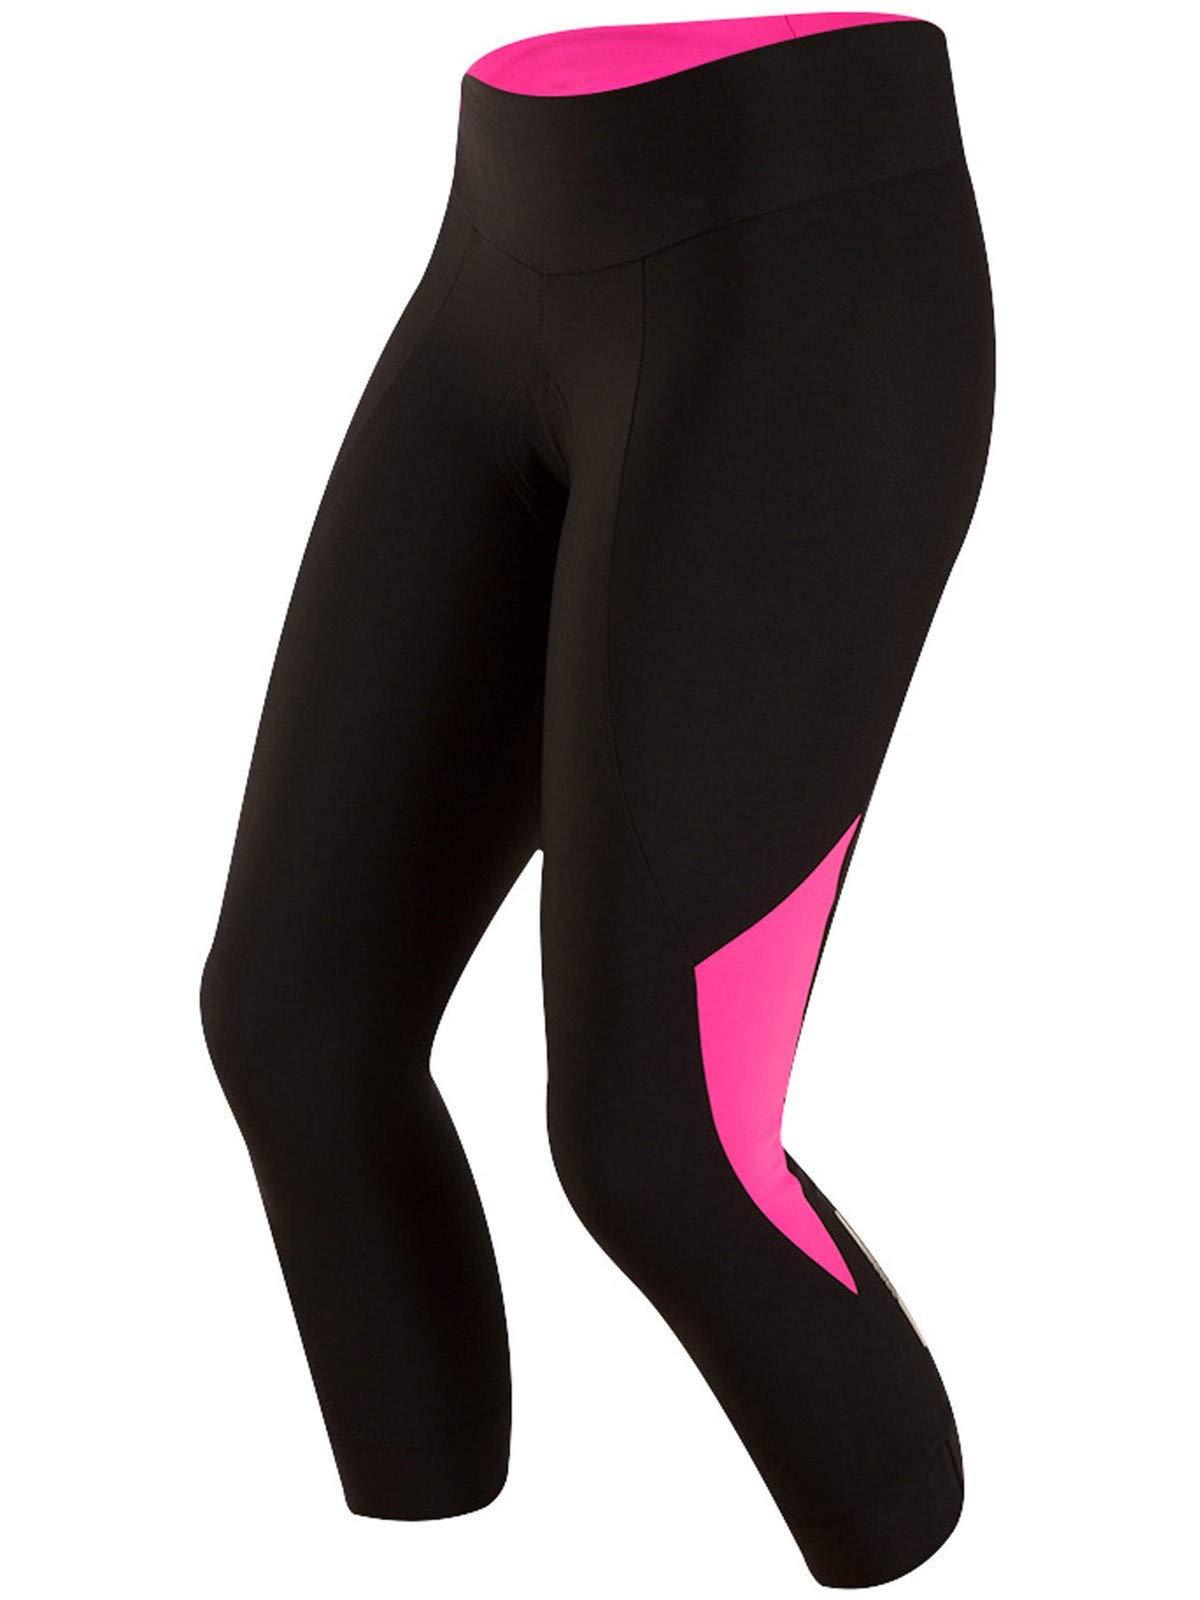 Pearl iZUMi Women's Select Pursuit 3 Quarter Tights, Black/Screaming Pink, X-Small